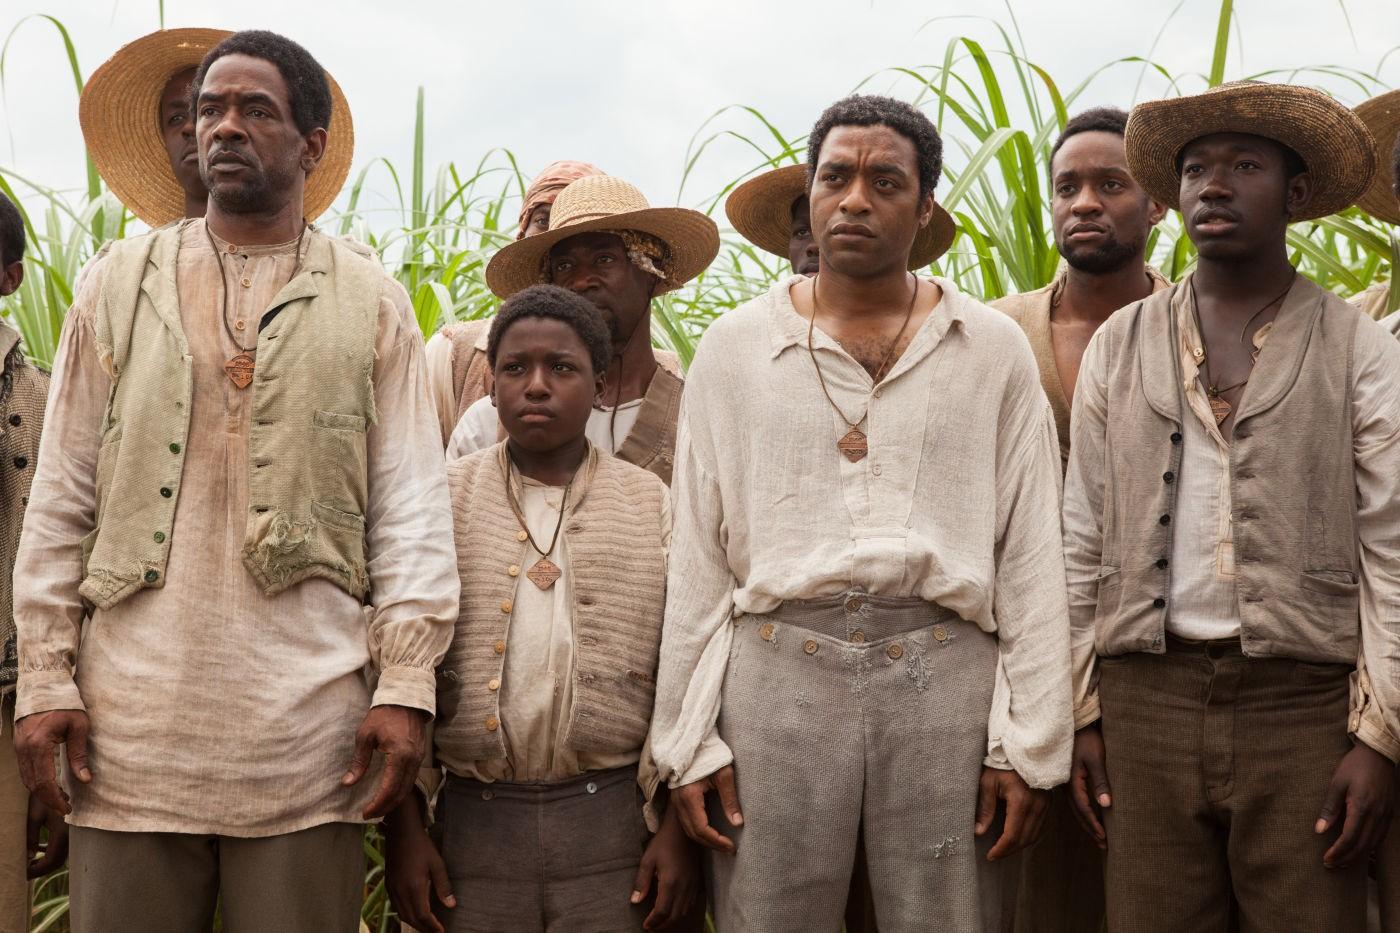 12 years a slave; the landmark film of the century so far?